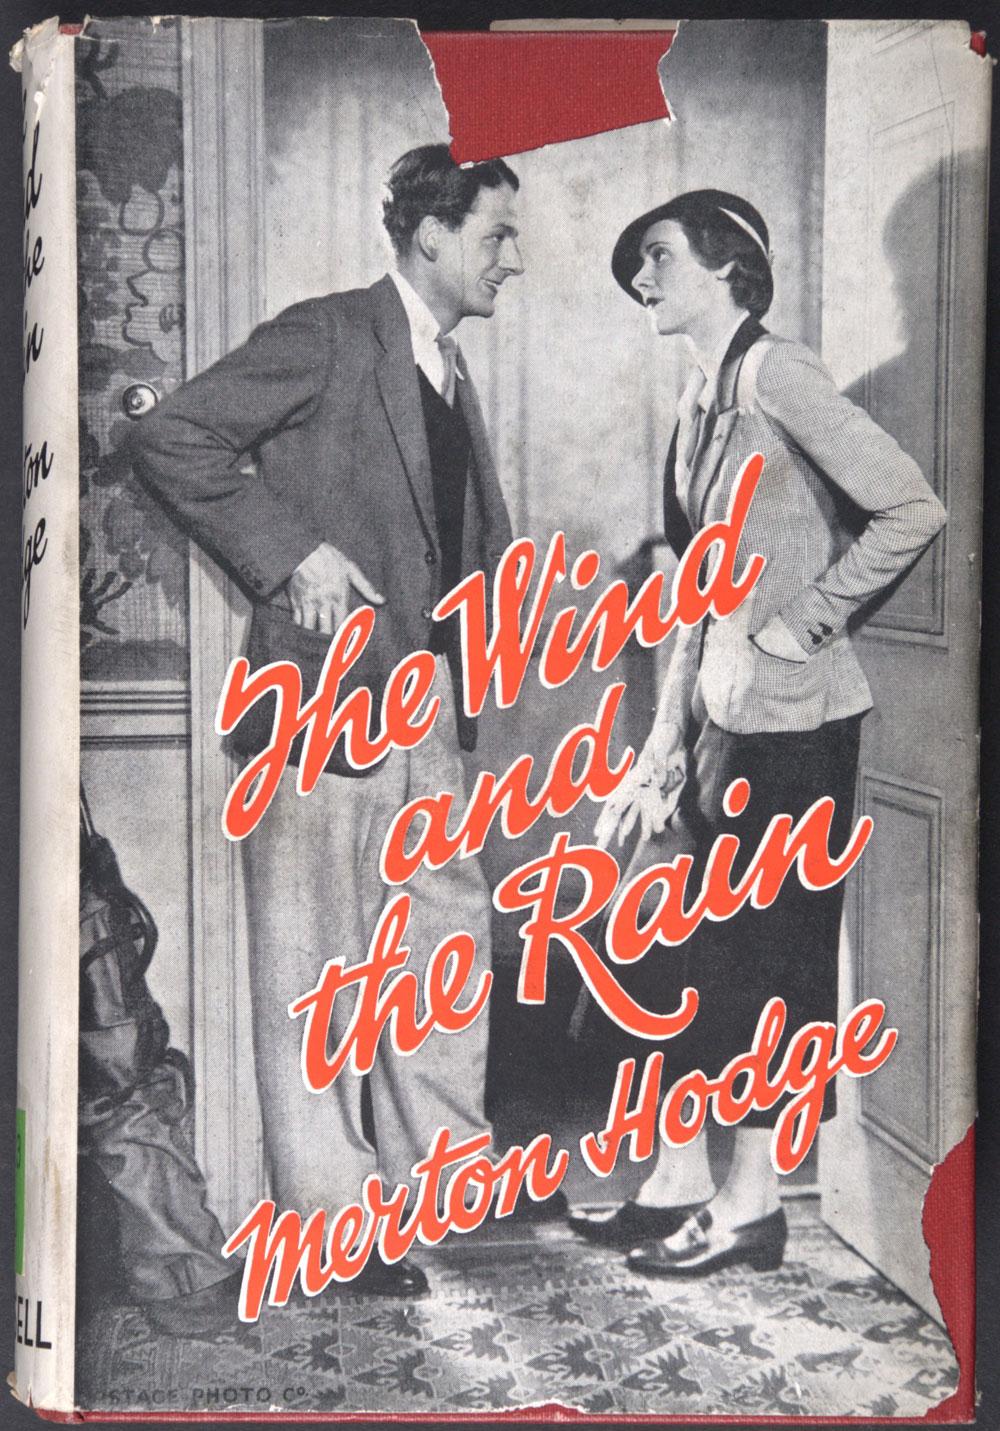 Merton Hodge. <em>The wind and the rain: a novel.</em> London: Cassell, 1936.